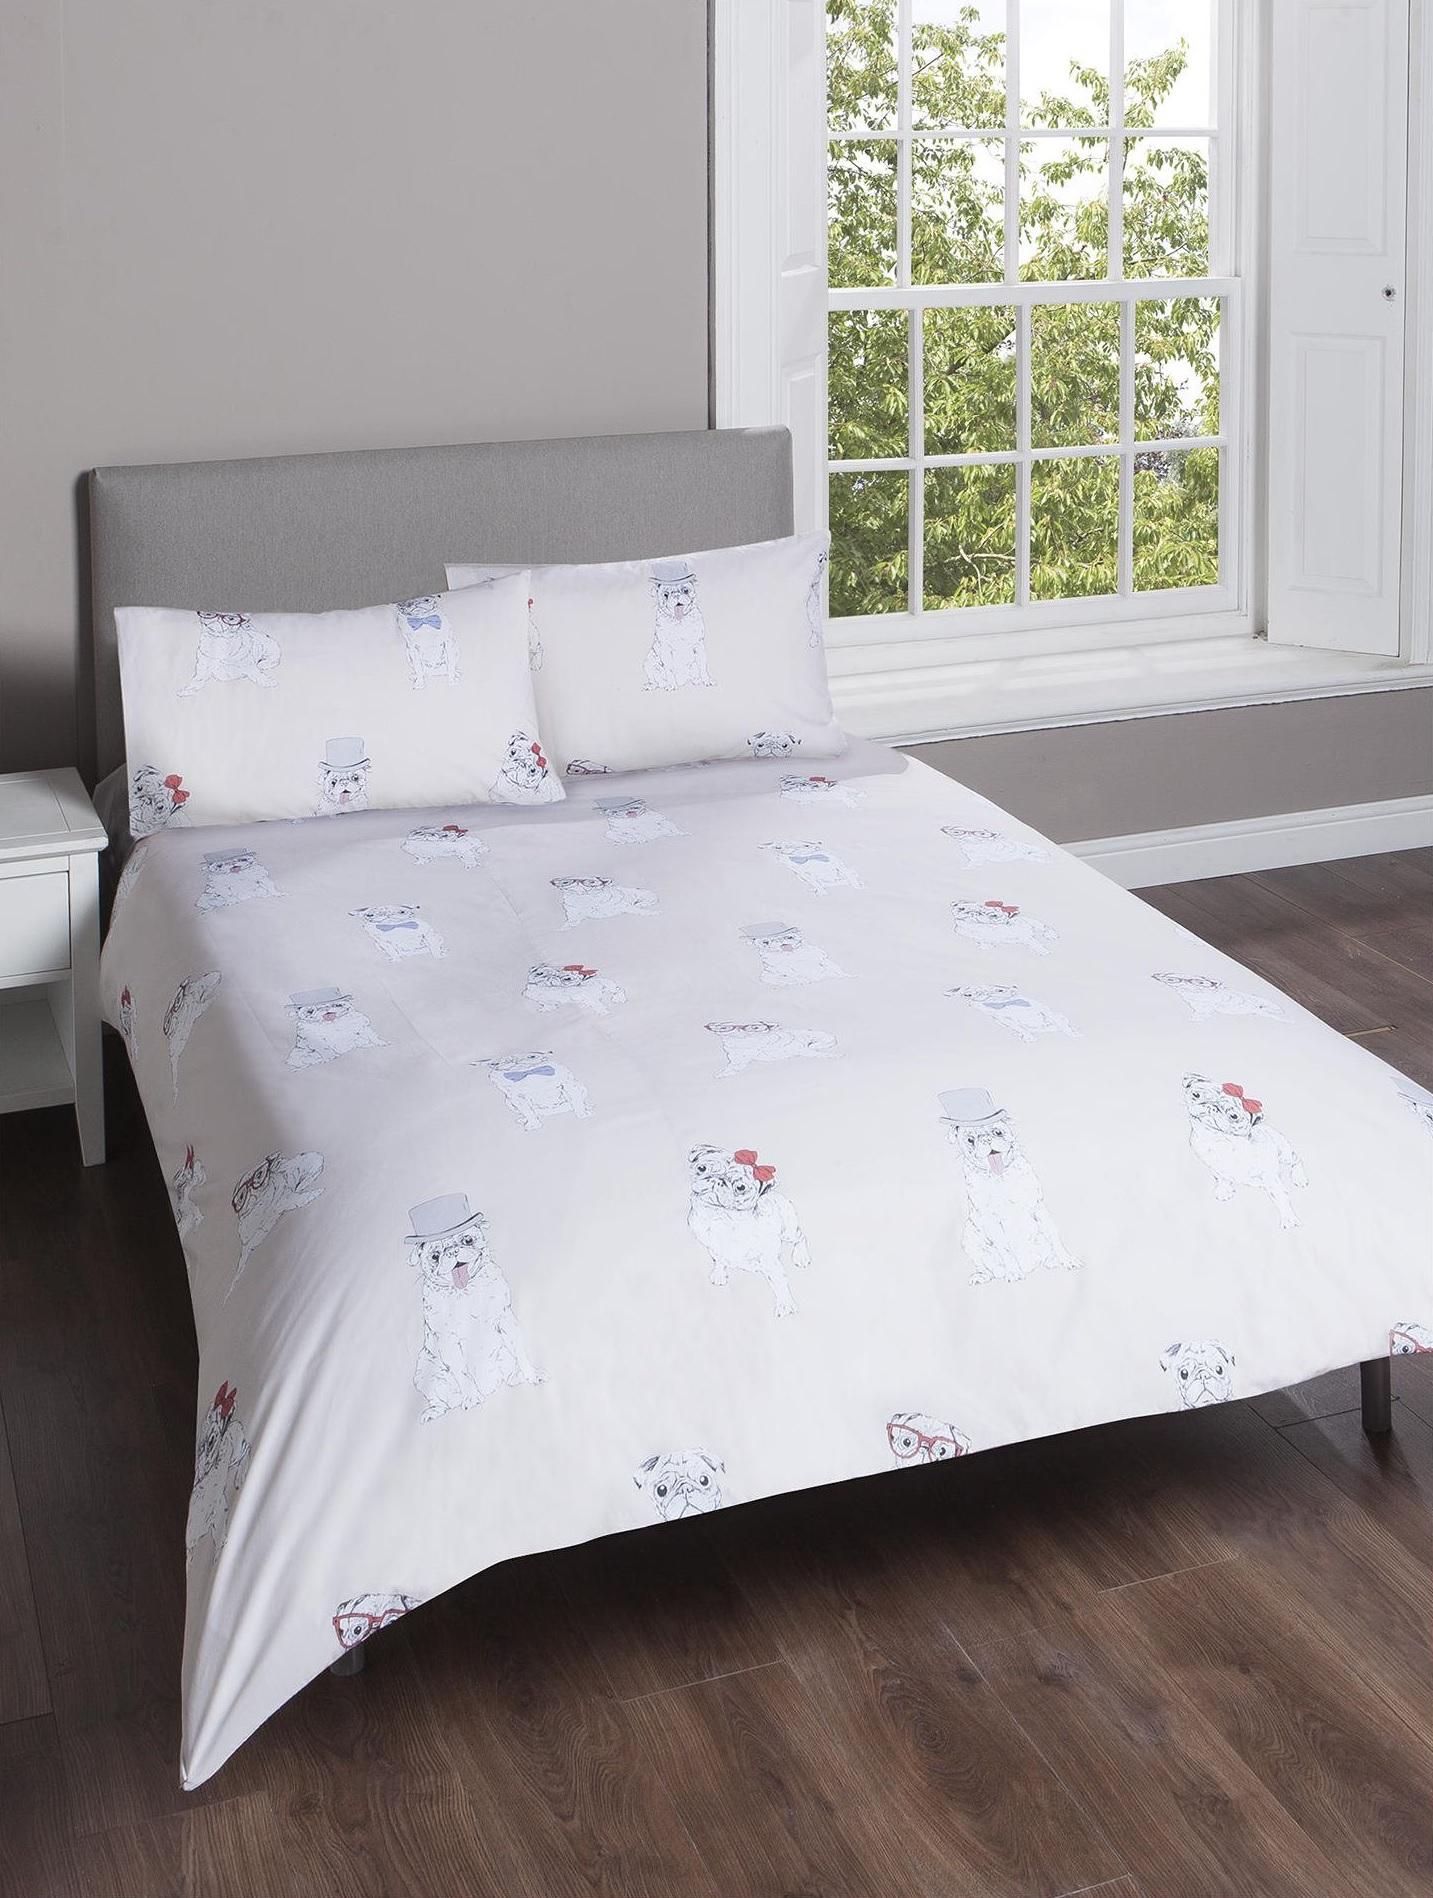 neu tesco king gro pug druck bettbezug kissenbezug set beige ebay. Black Bedroom Furniture Sets. Home Design Ideas